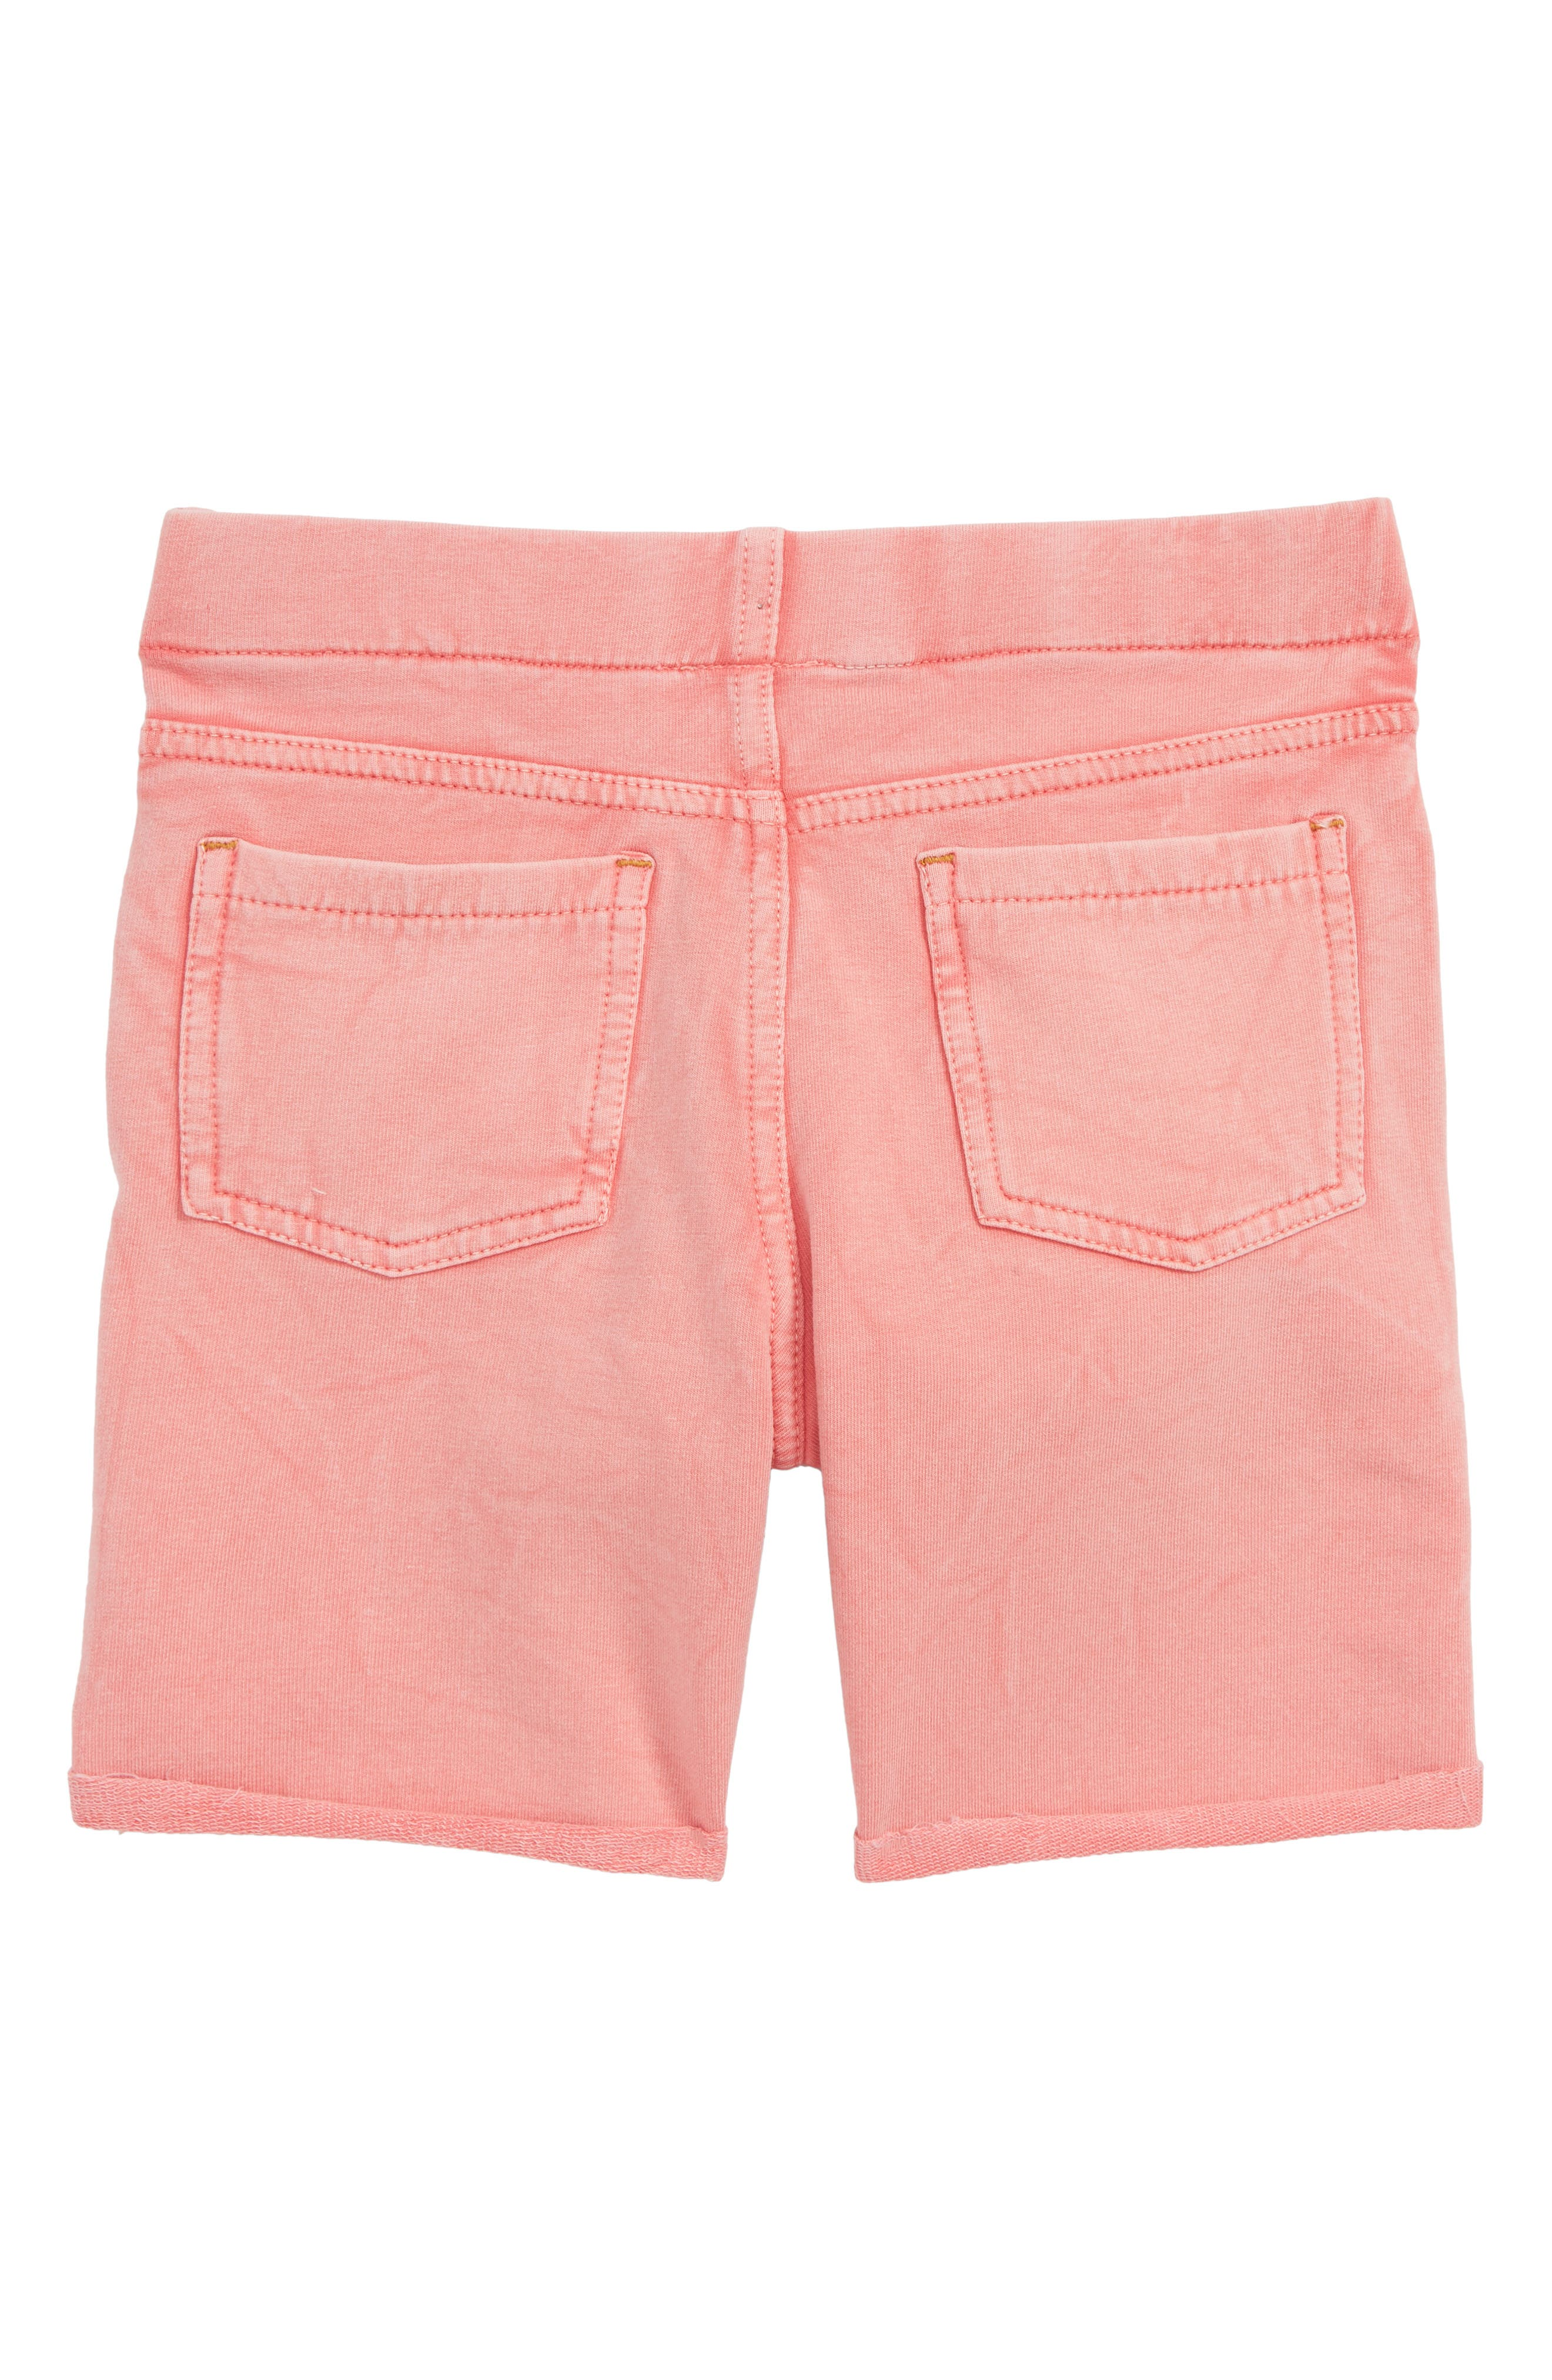 'Jenna' Jegging Shorts,                             Alternate thumbnail 2, color,                             Coral Shell Wash